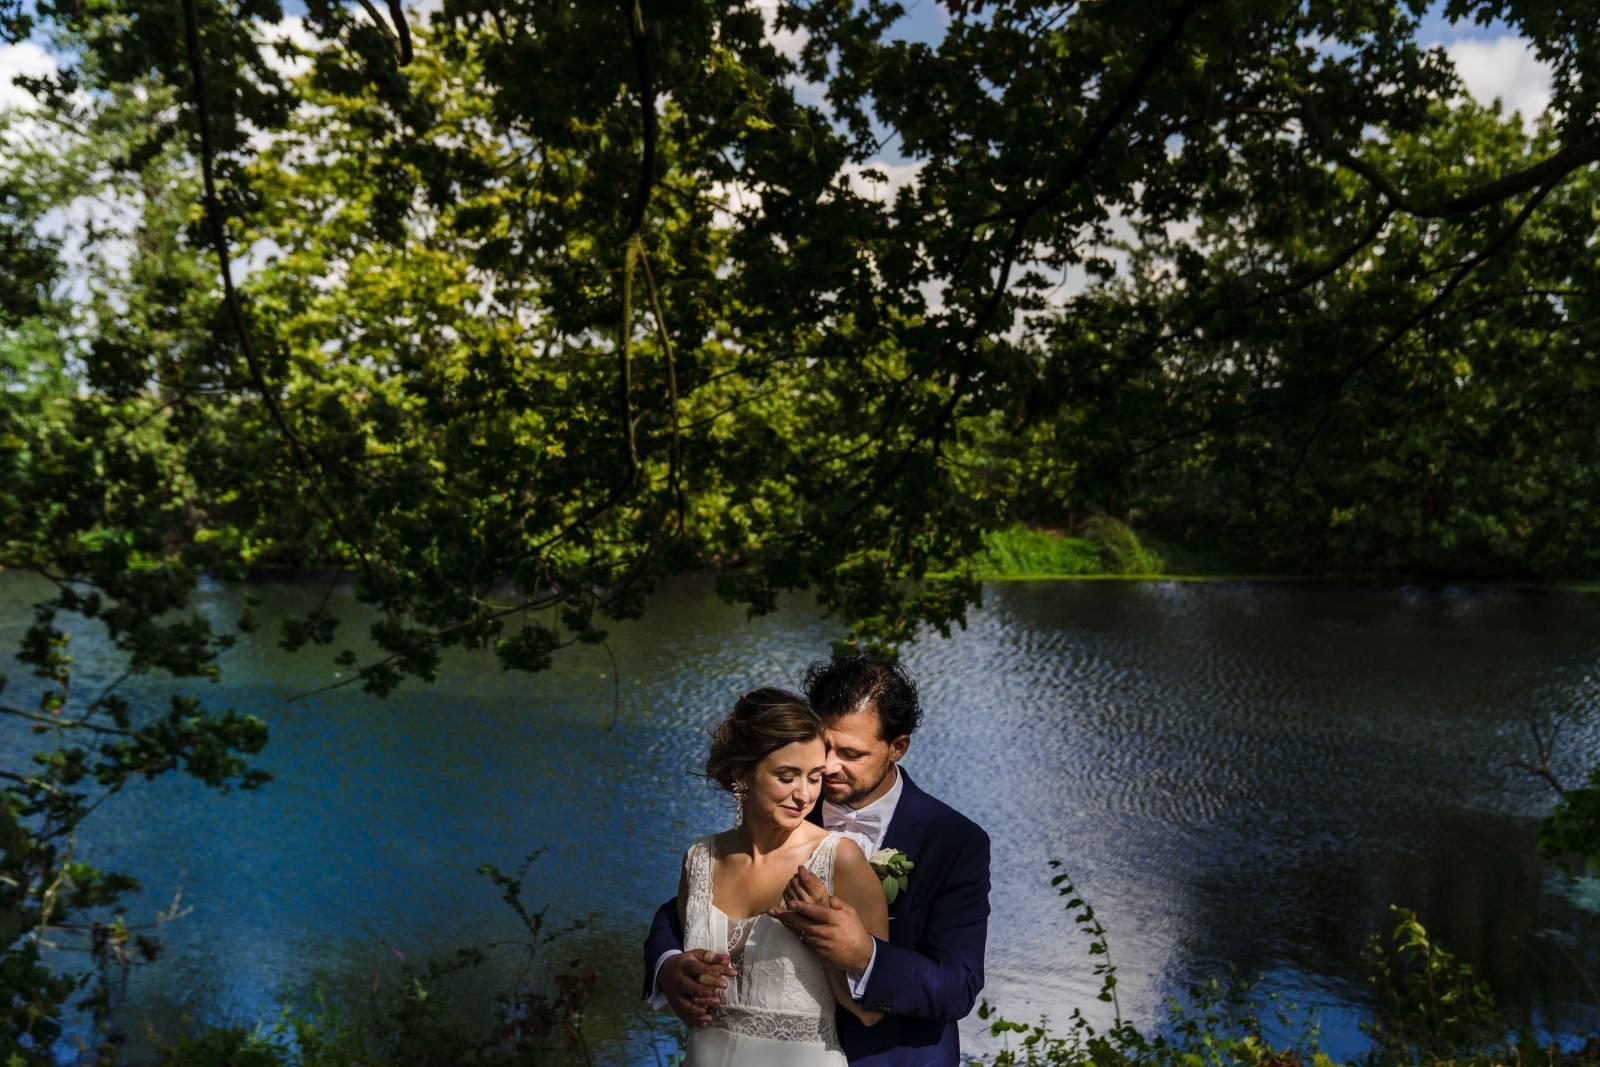 Philippe Swiggers - huwelijksfotograaf - House of Weddings - 7